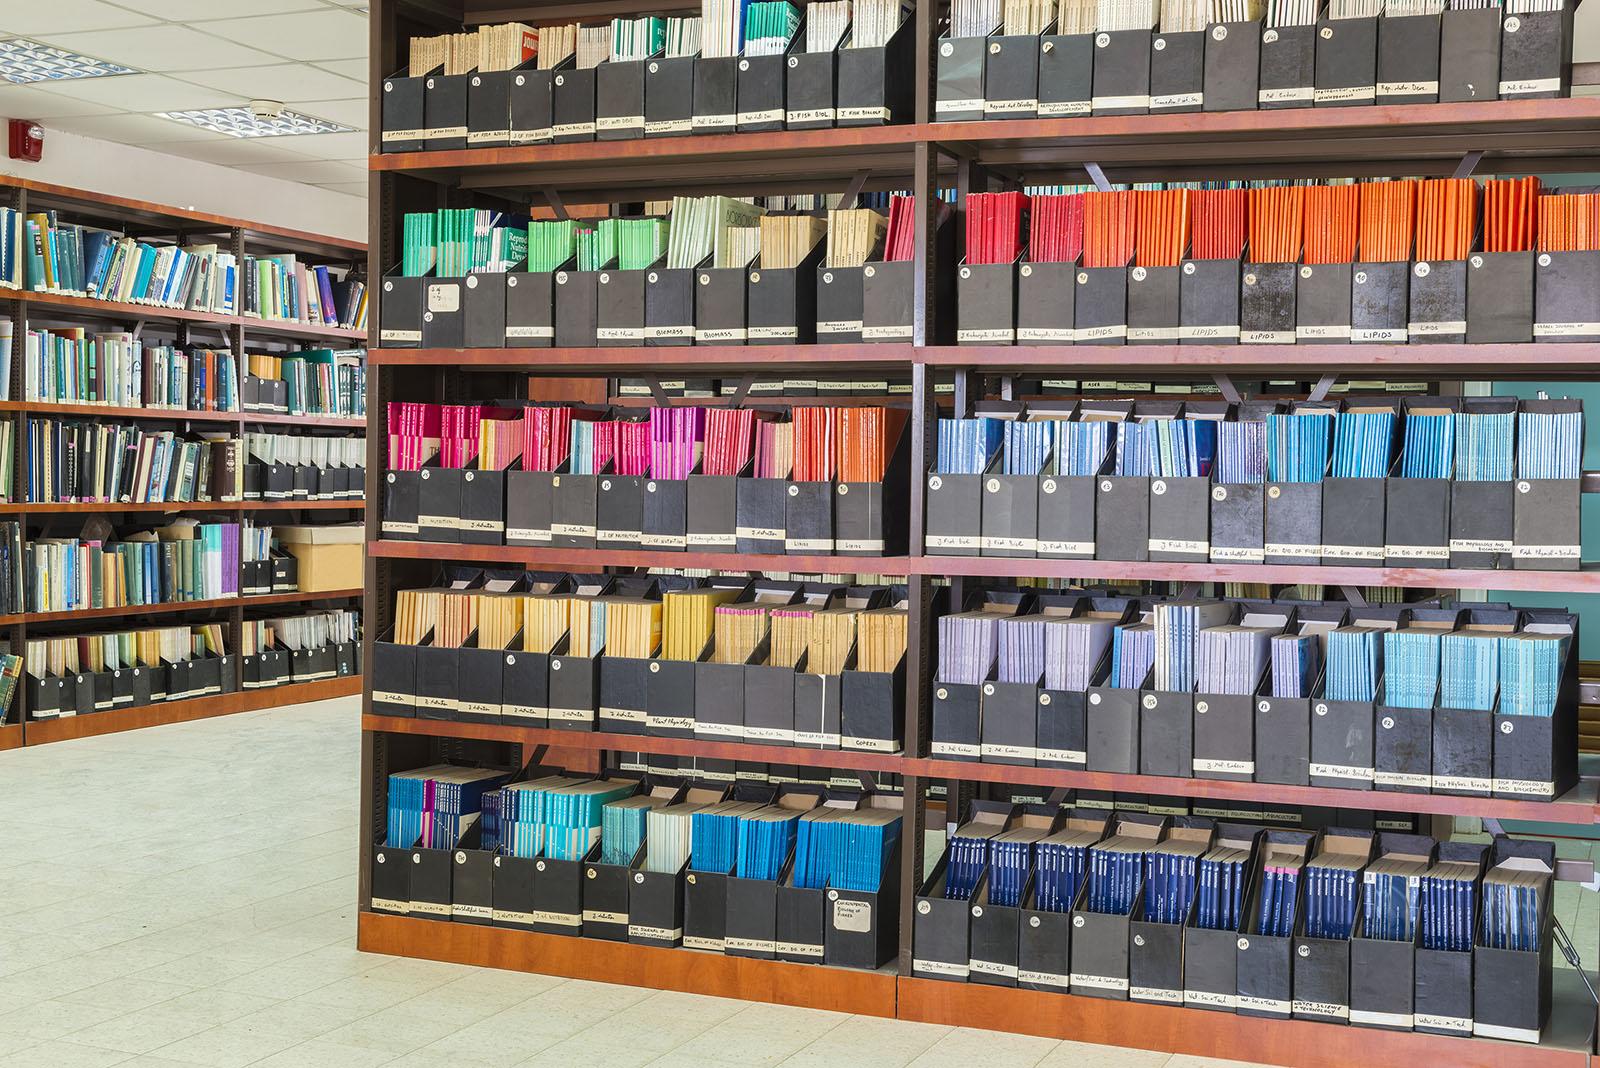 colored-books-on-shelf